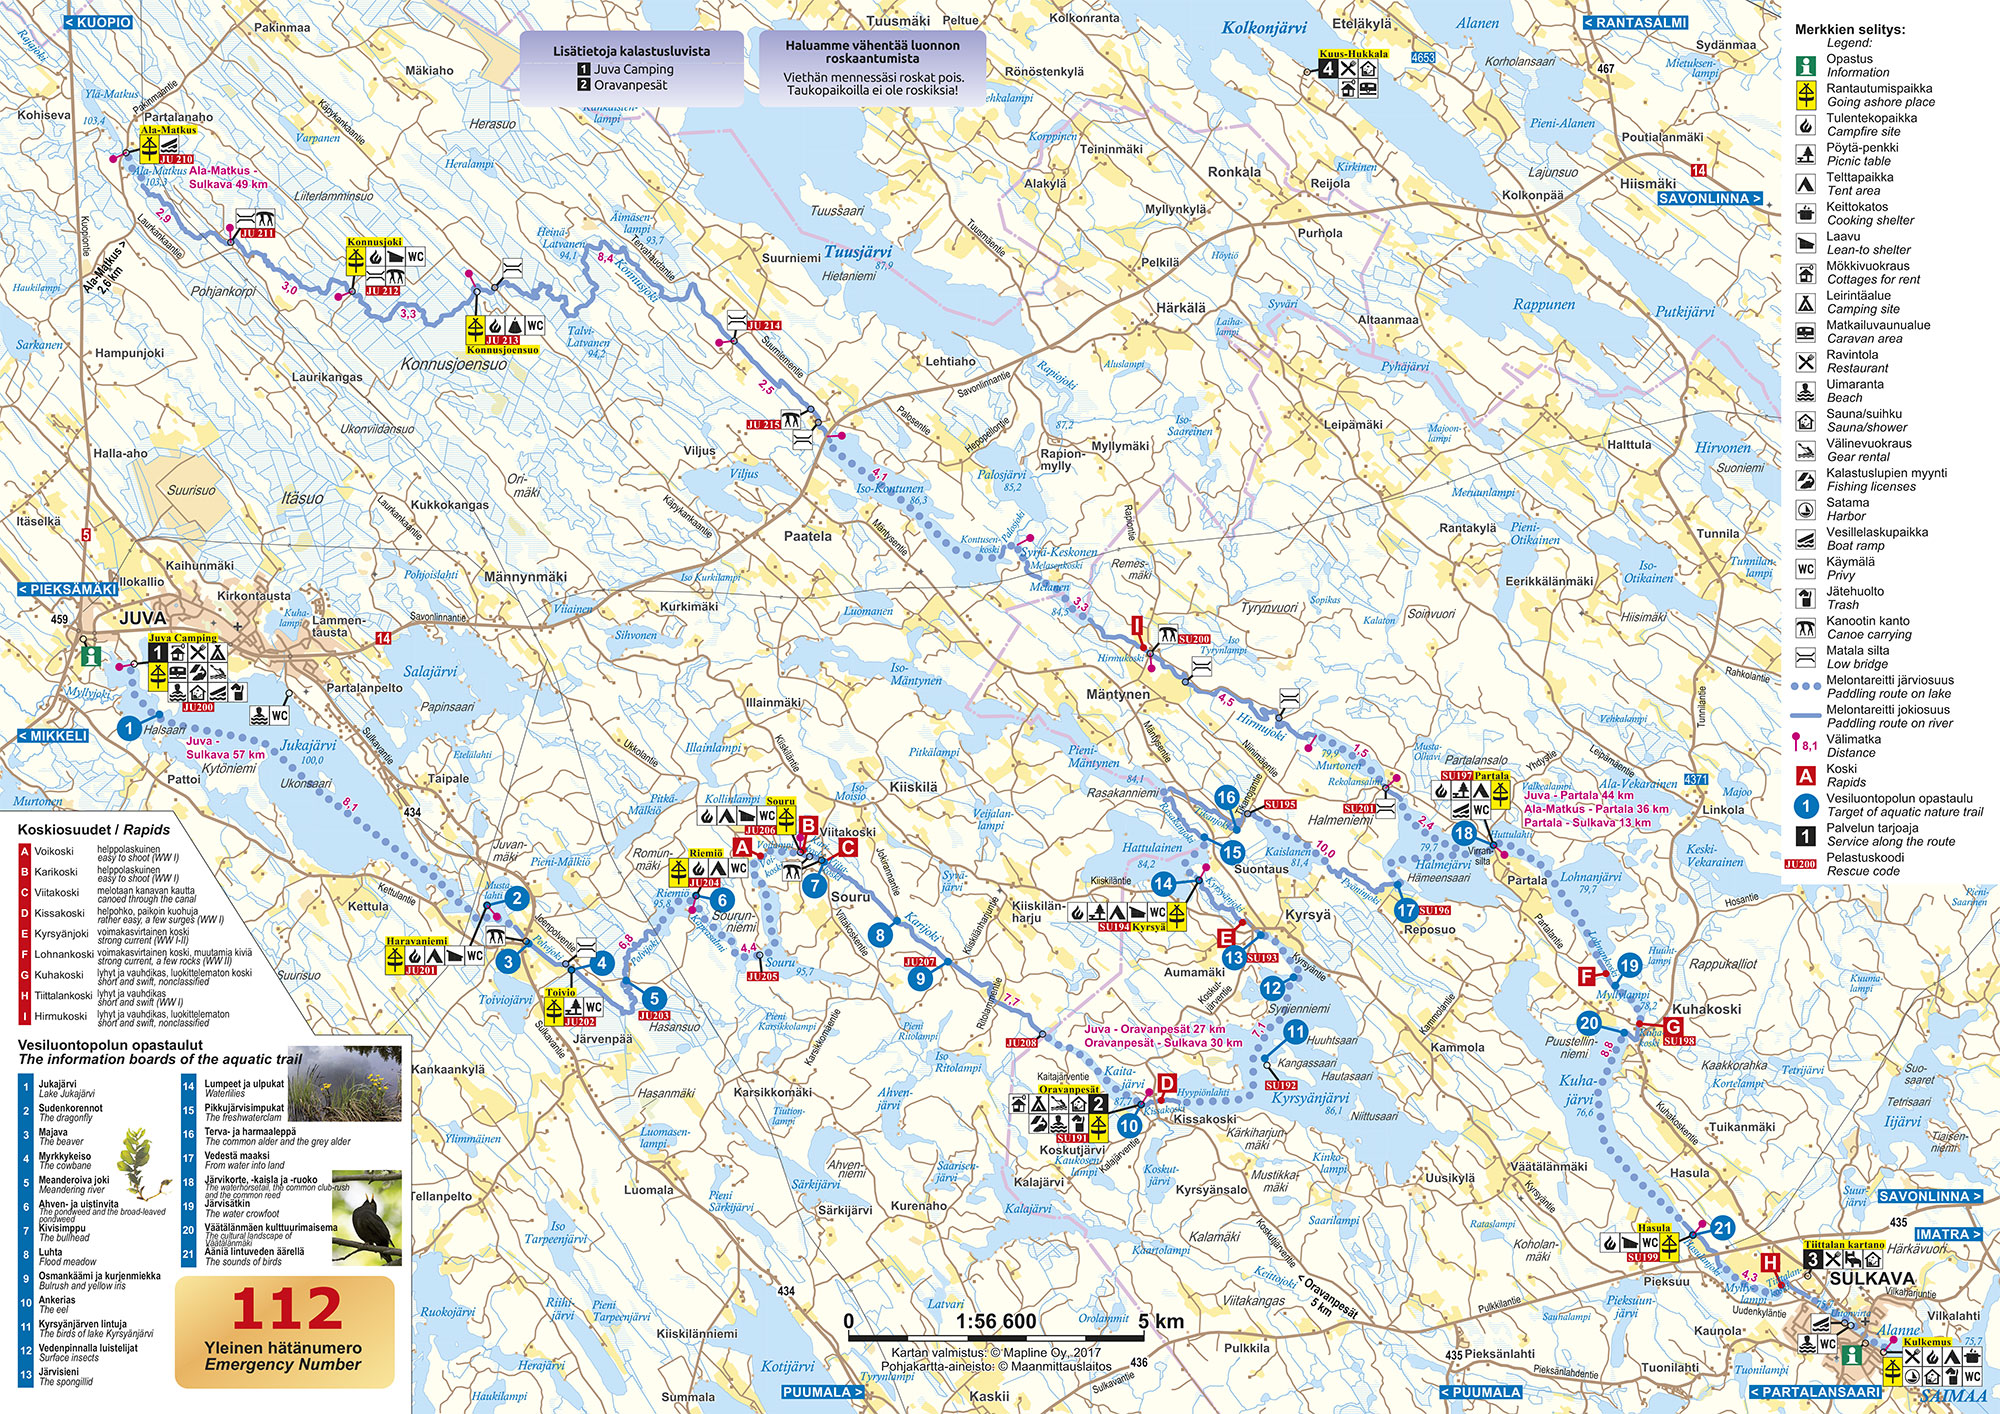 The route description - Oravareitti